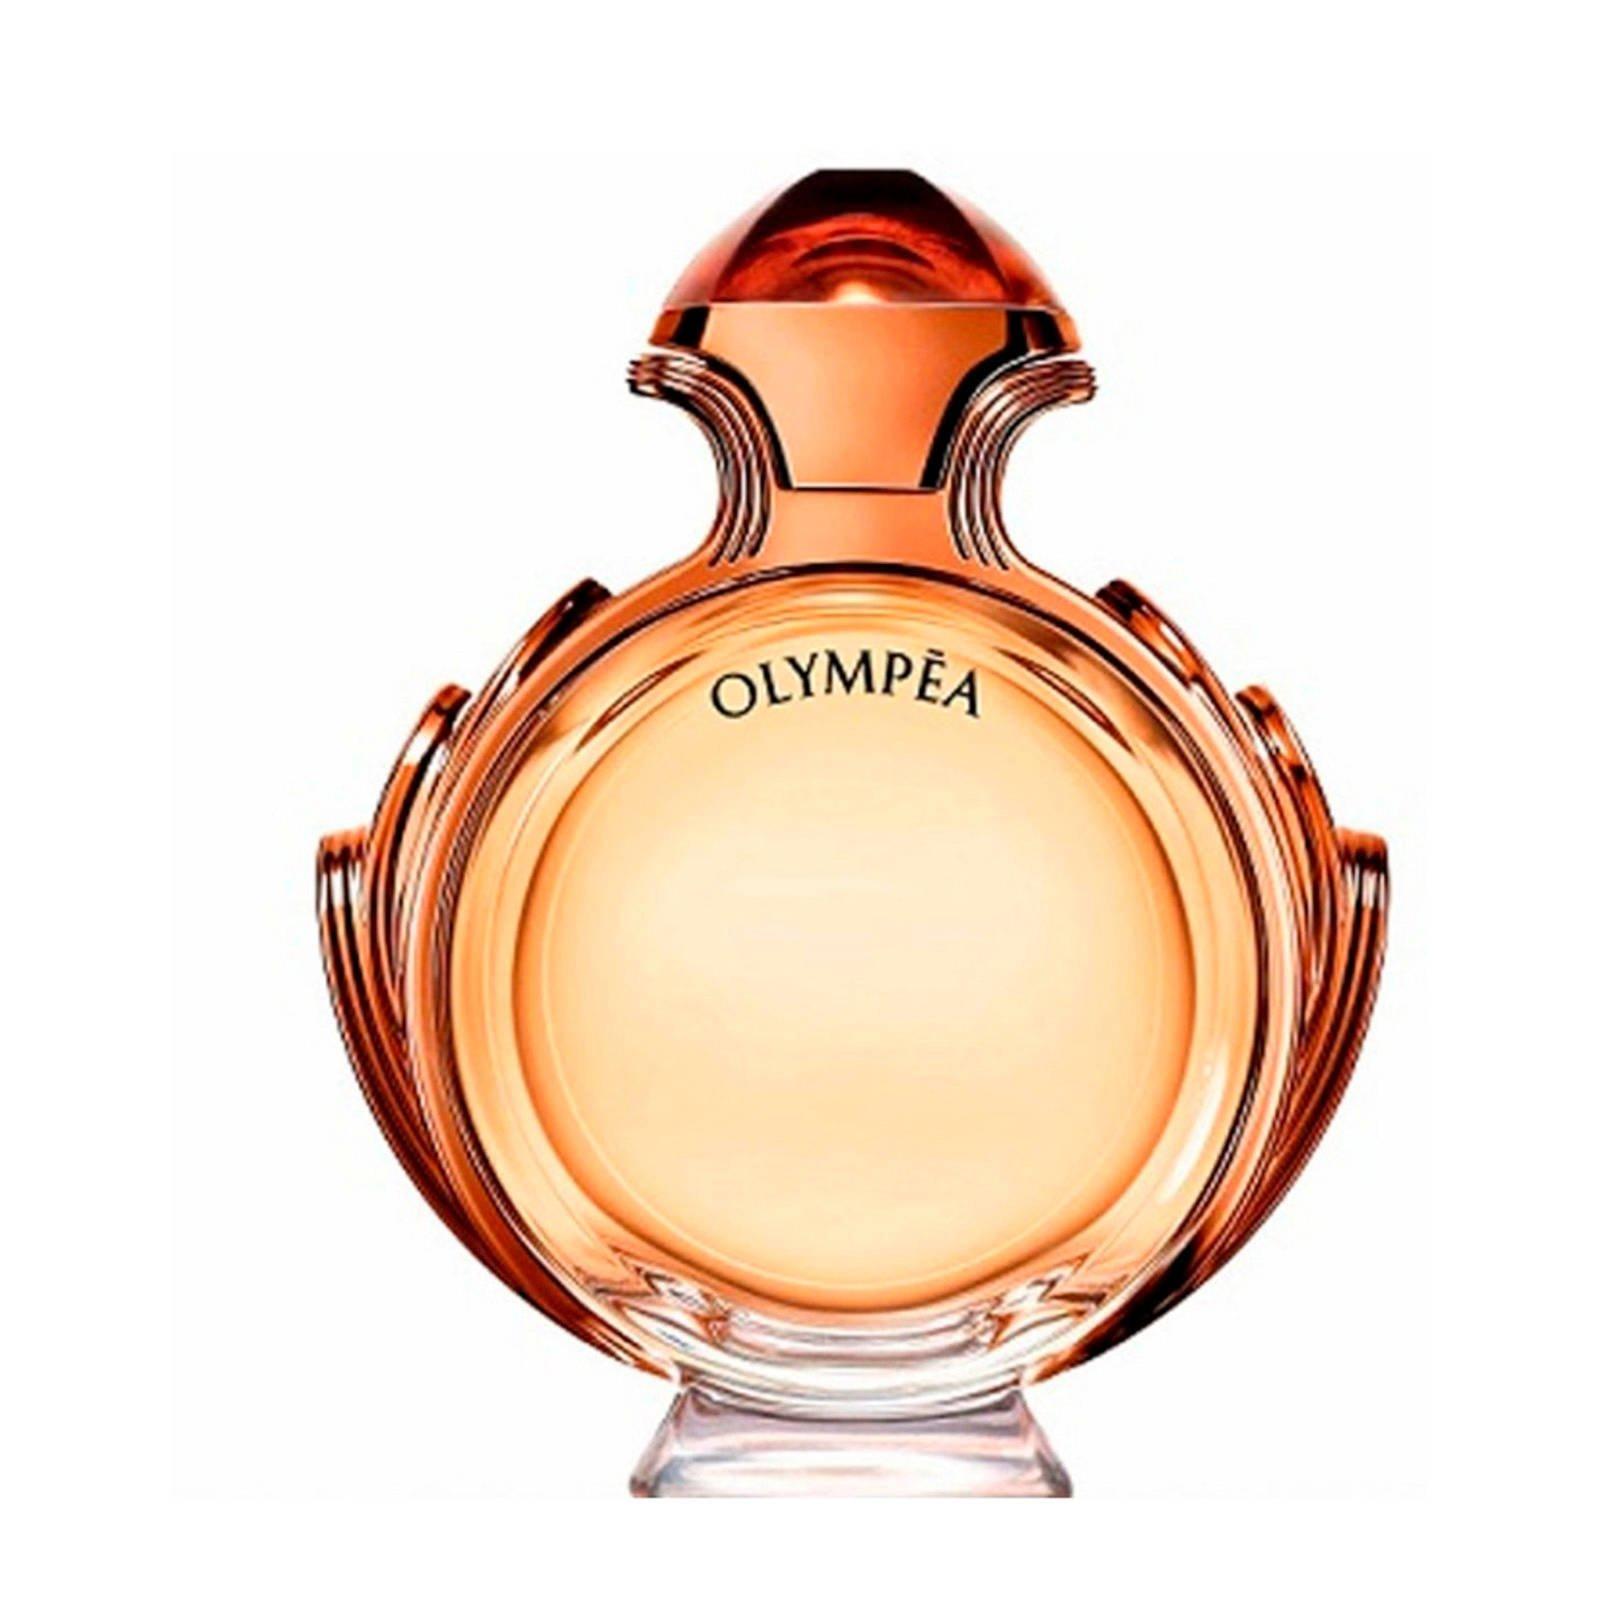 Olympea Intense eau de parfum 80 ml